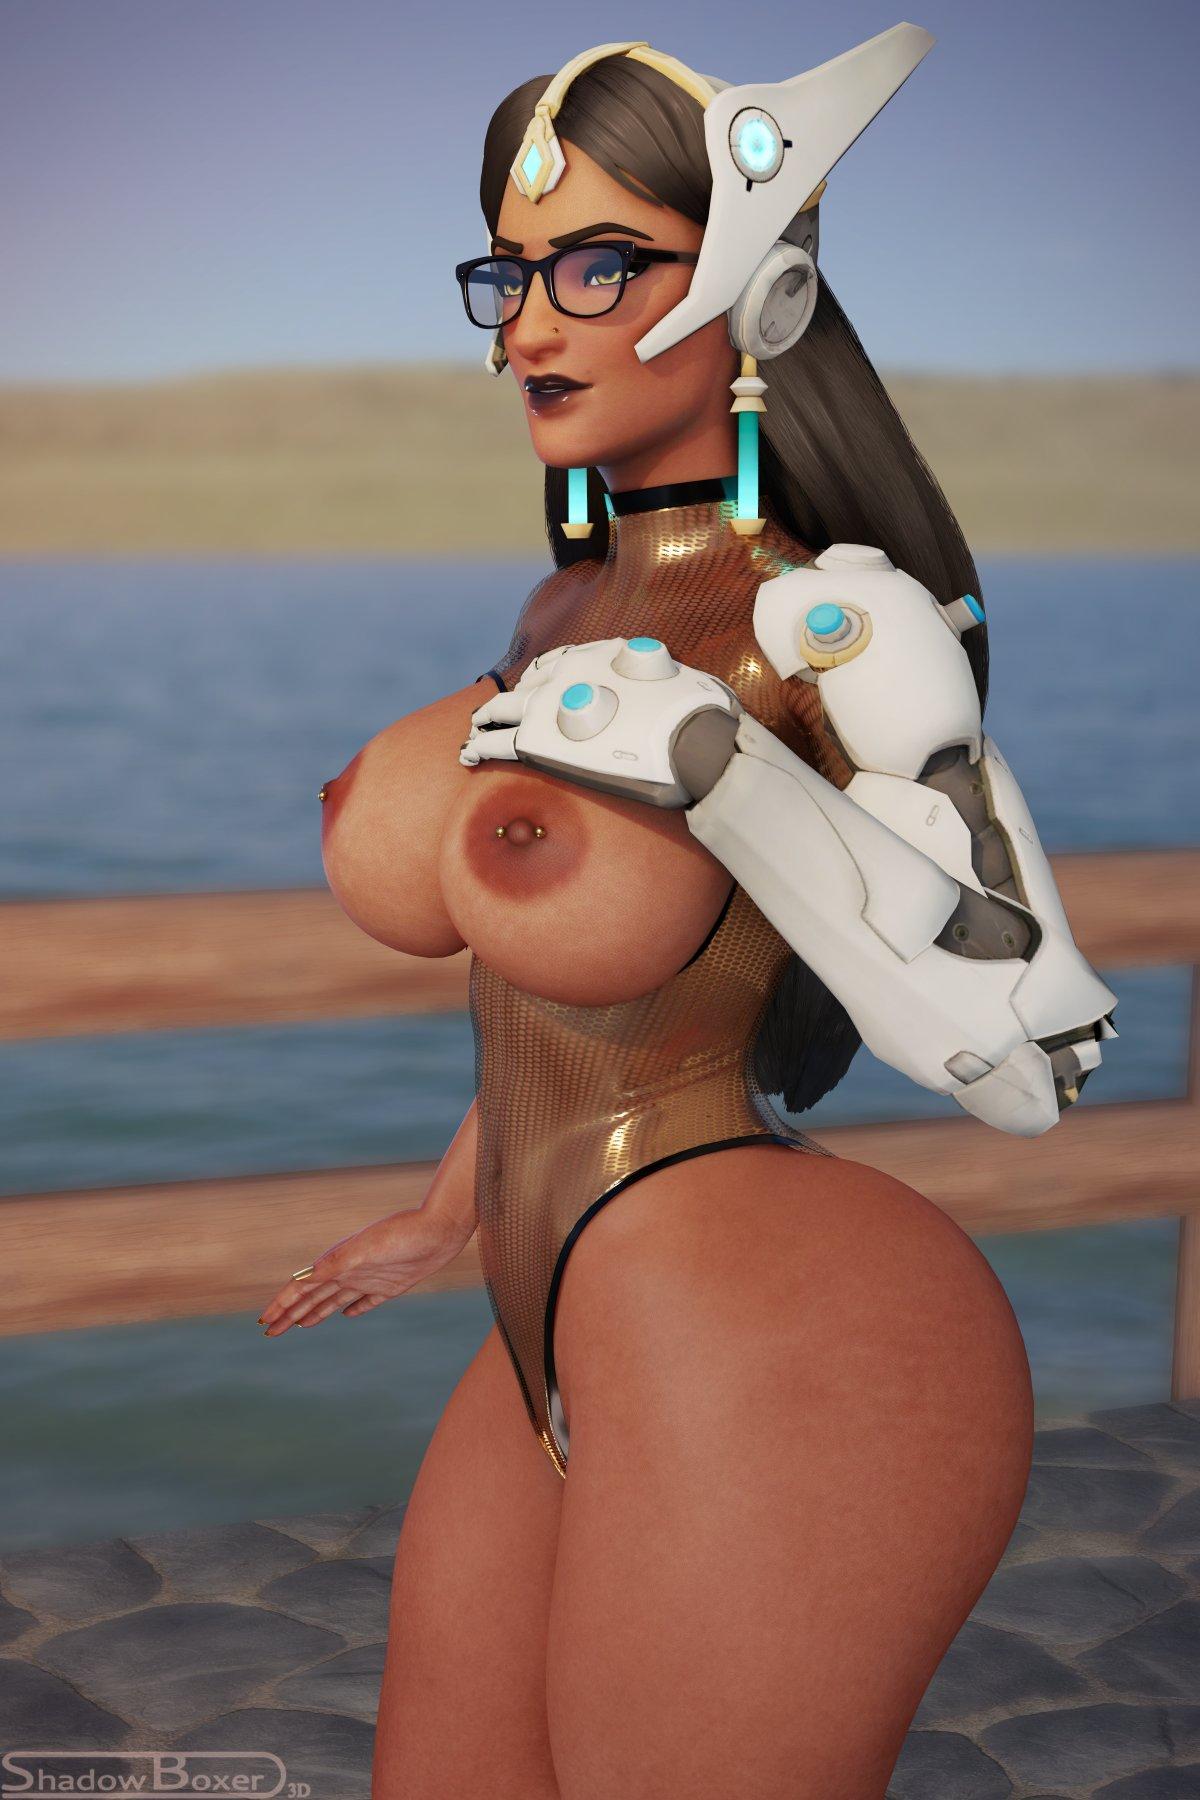 overwatch-hentai-art-–-big-breasts,-large-breasts,-solo,-dark-skinned-female,-blender,-shadowboxer